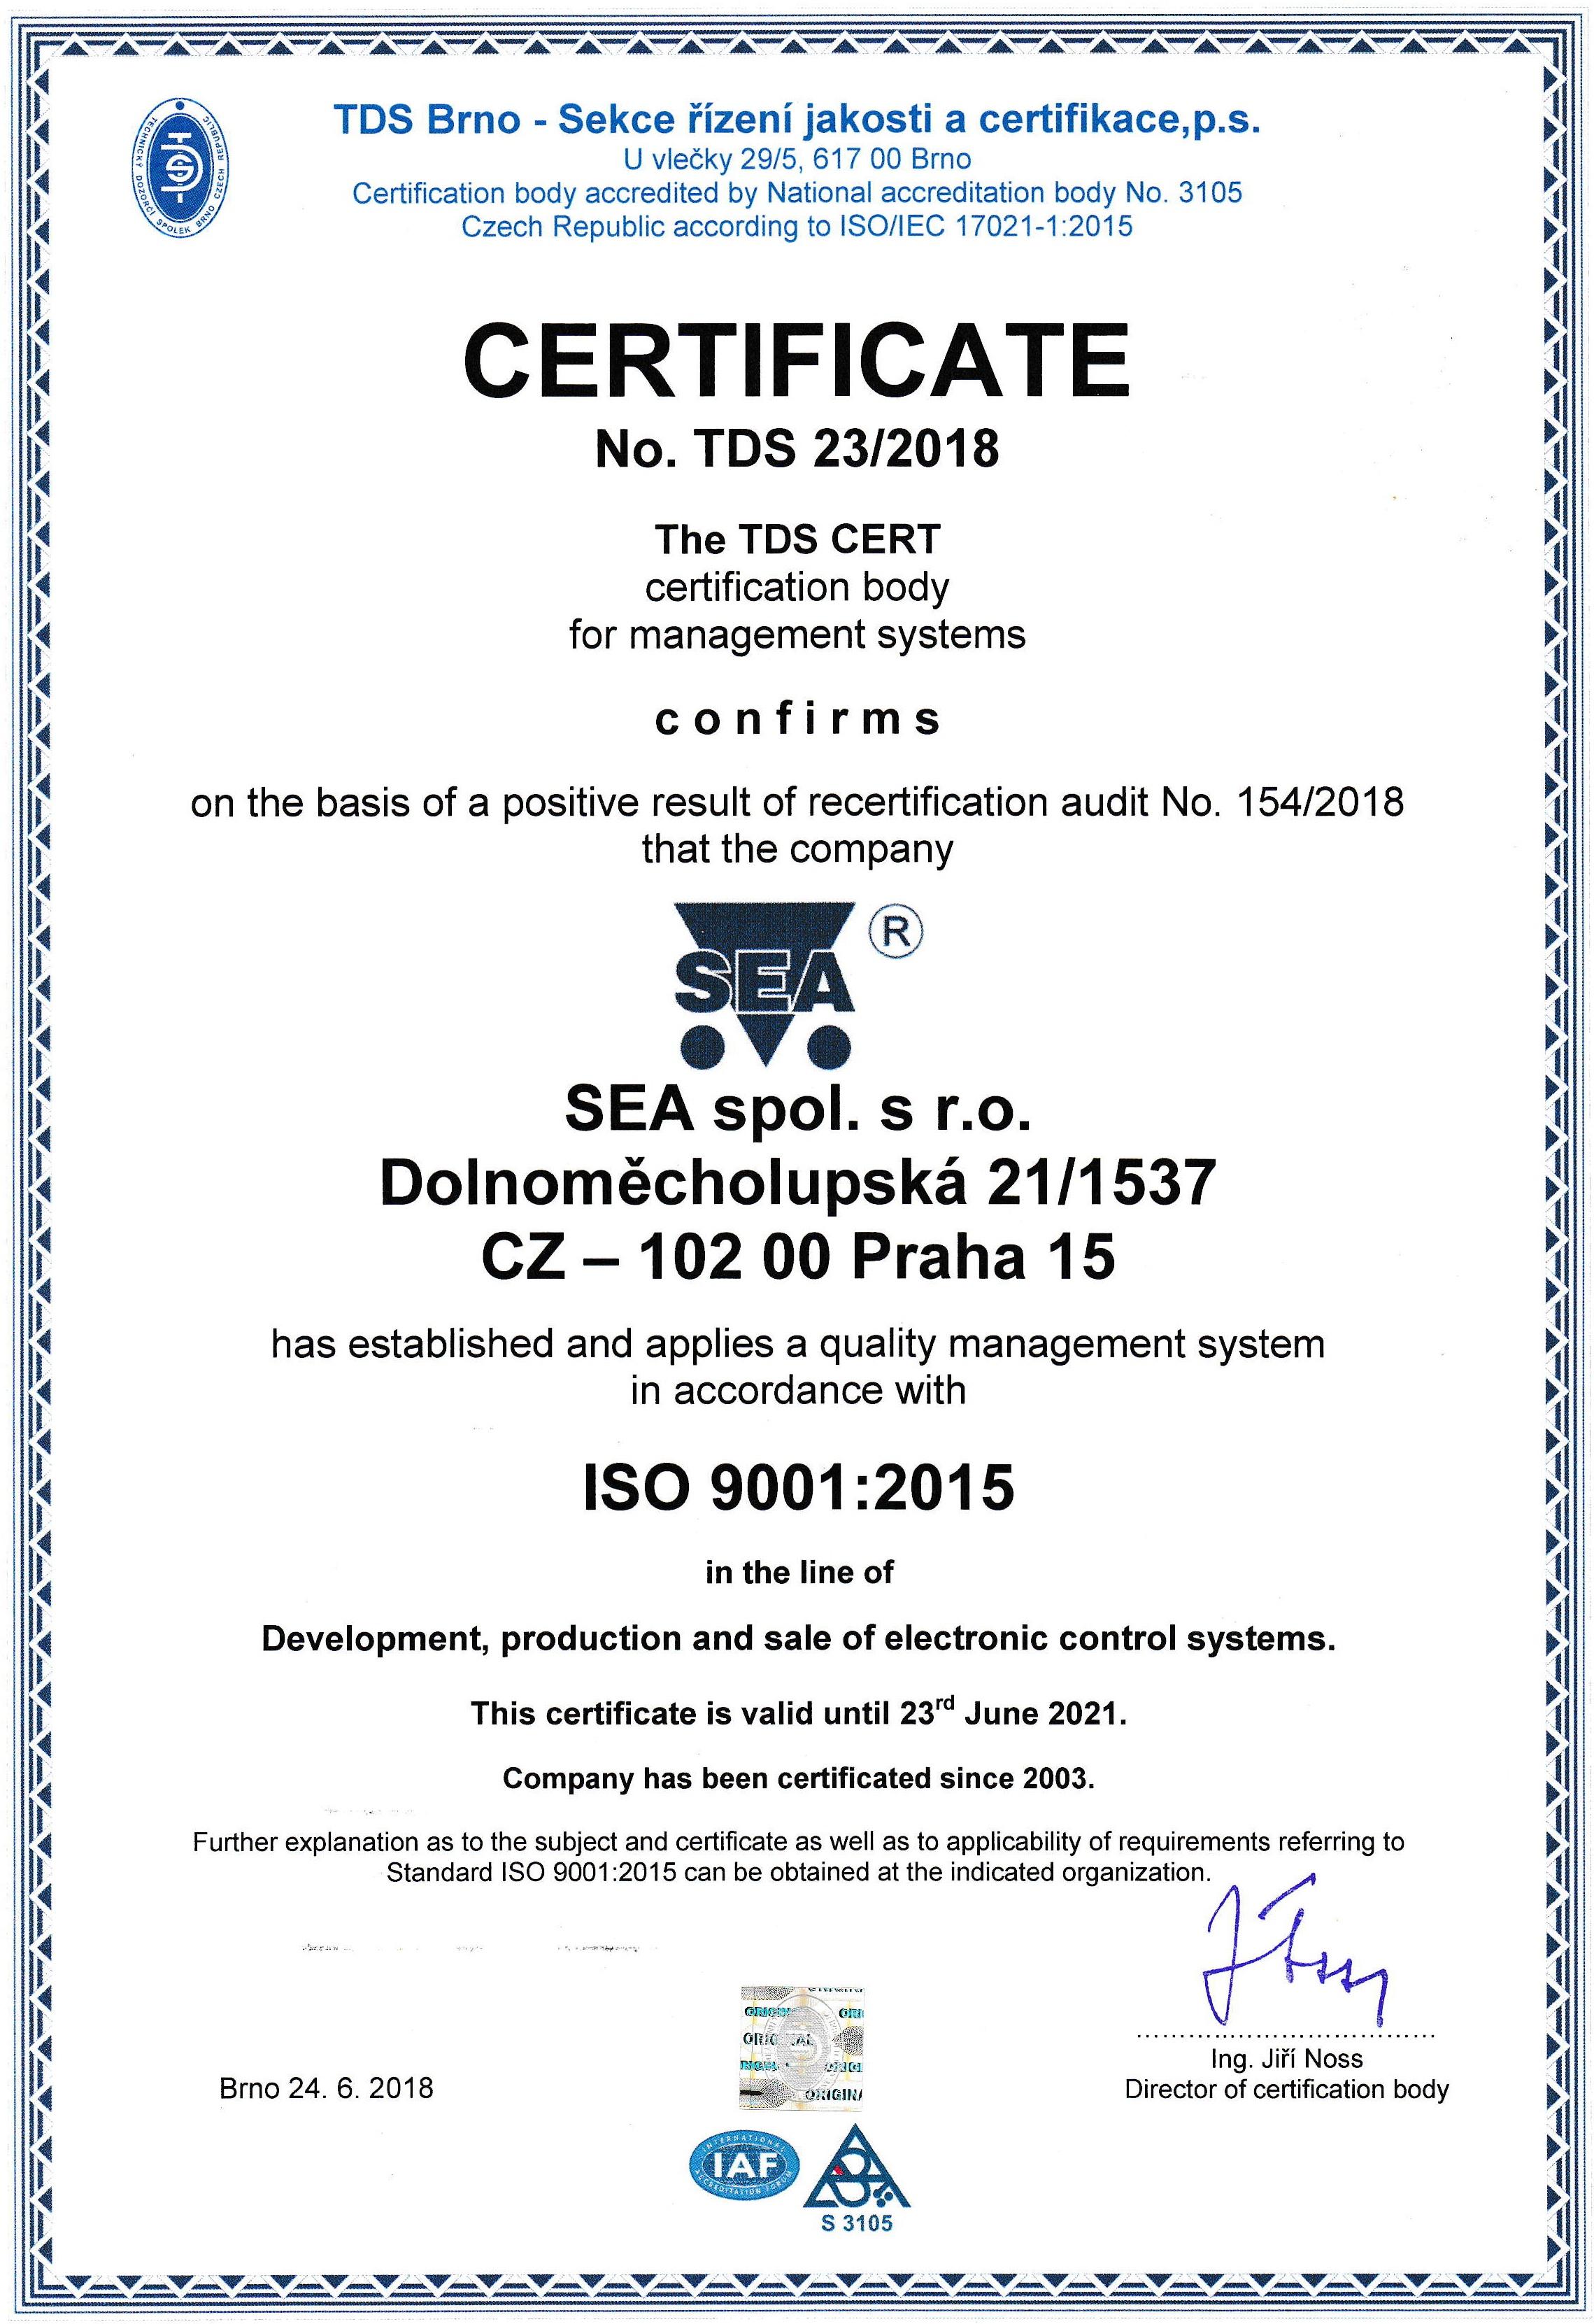 certifikat-tds-23-2018_en